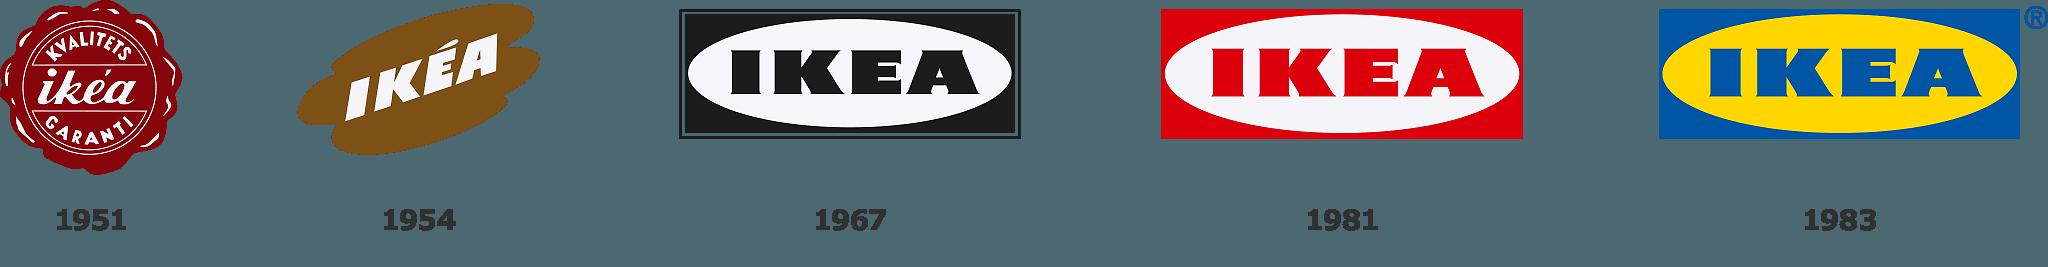 Ikea Logo Png Transparent & Svg Vector - Pluspng Pluspng.com - Ikea Logo PNG